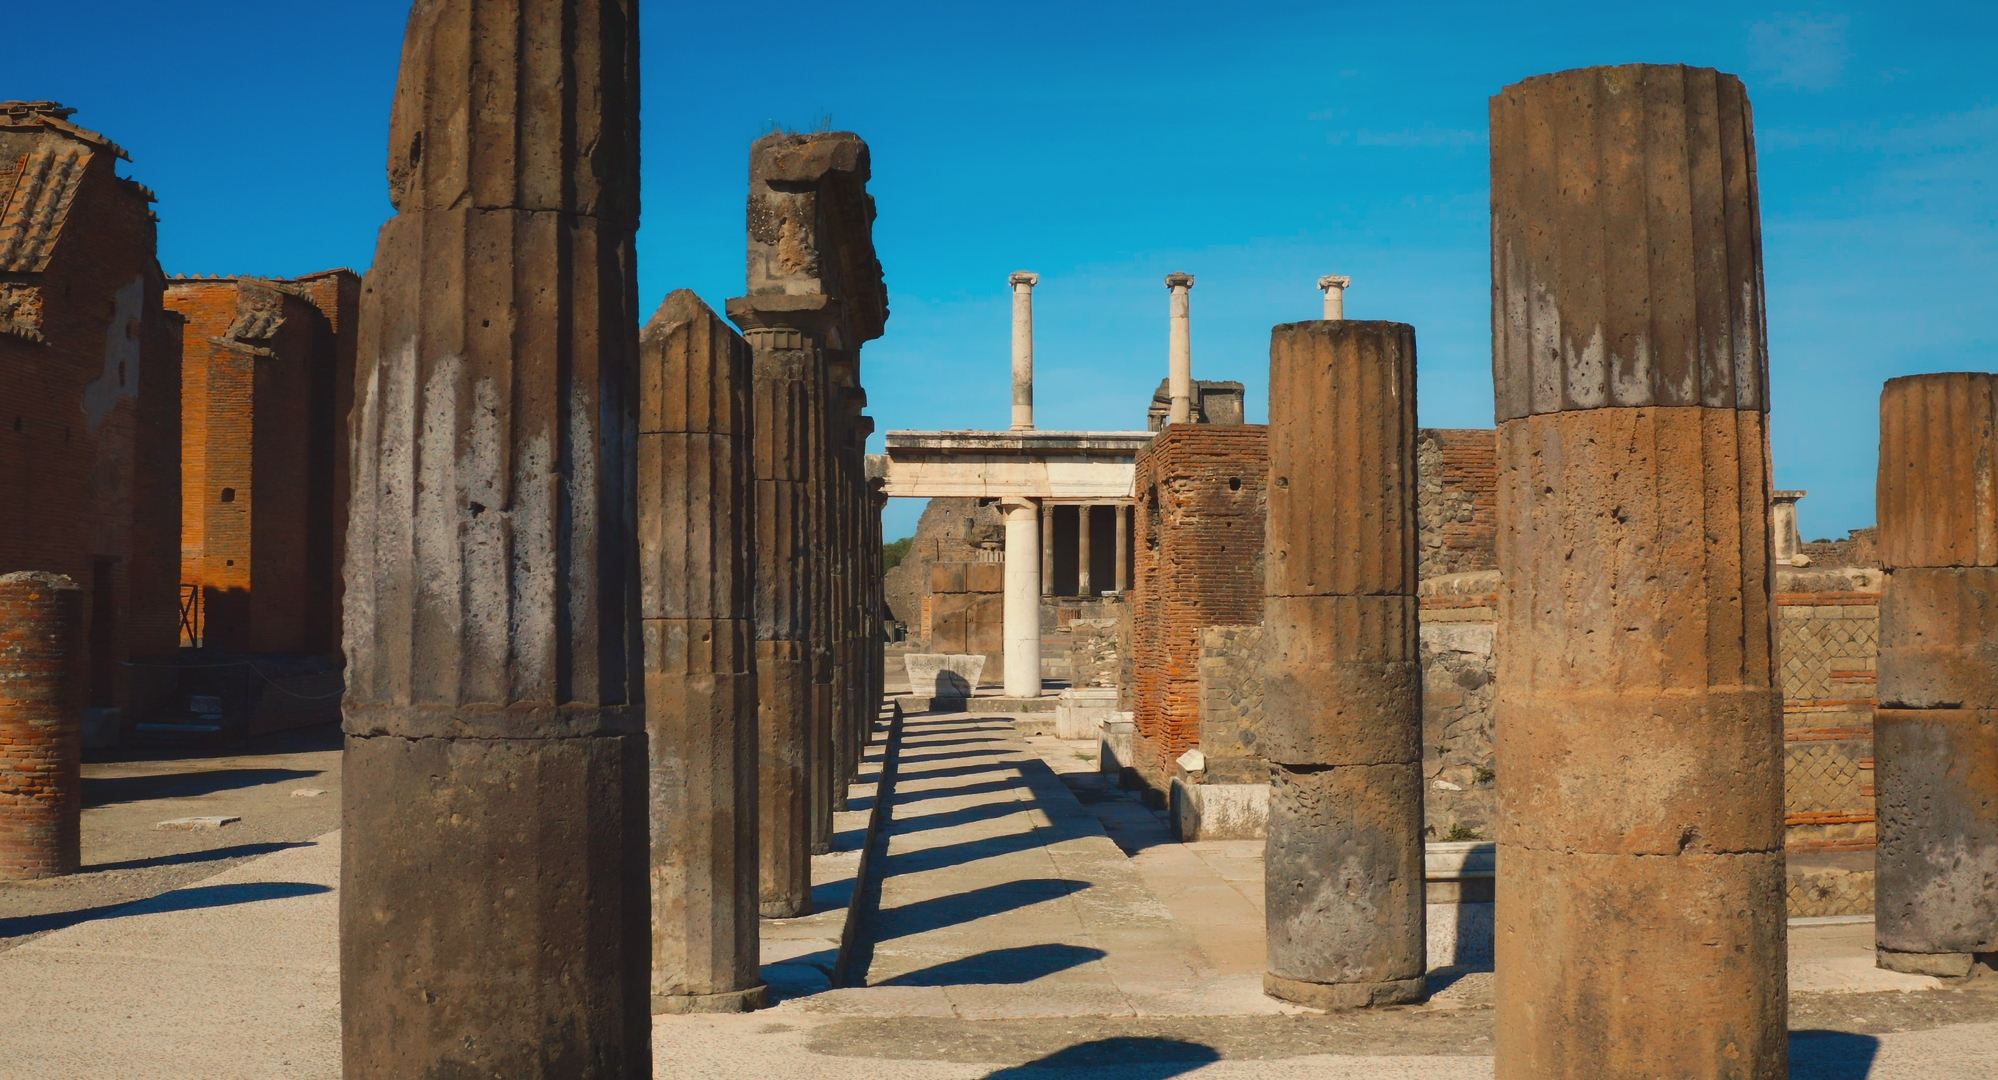 Still_Pompeii_Sin_City_001 copia